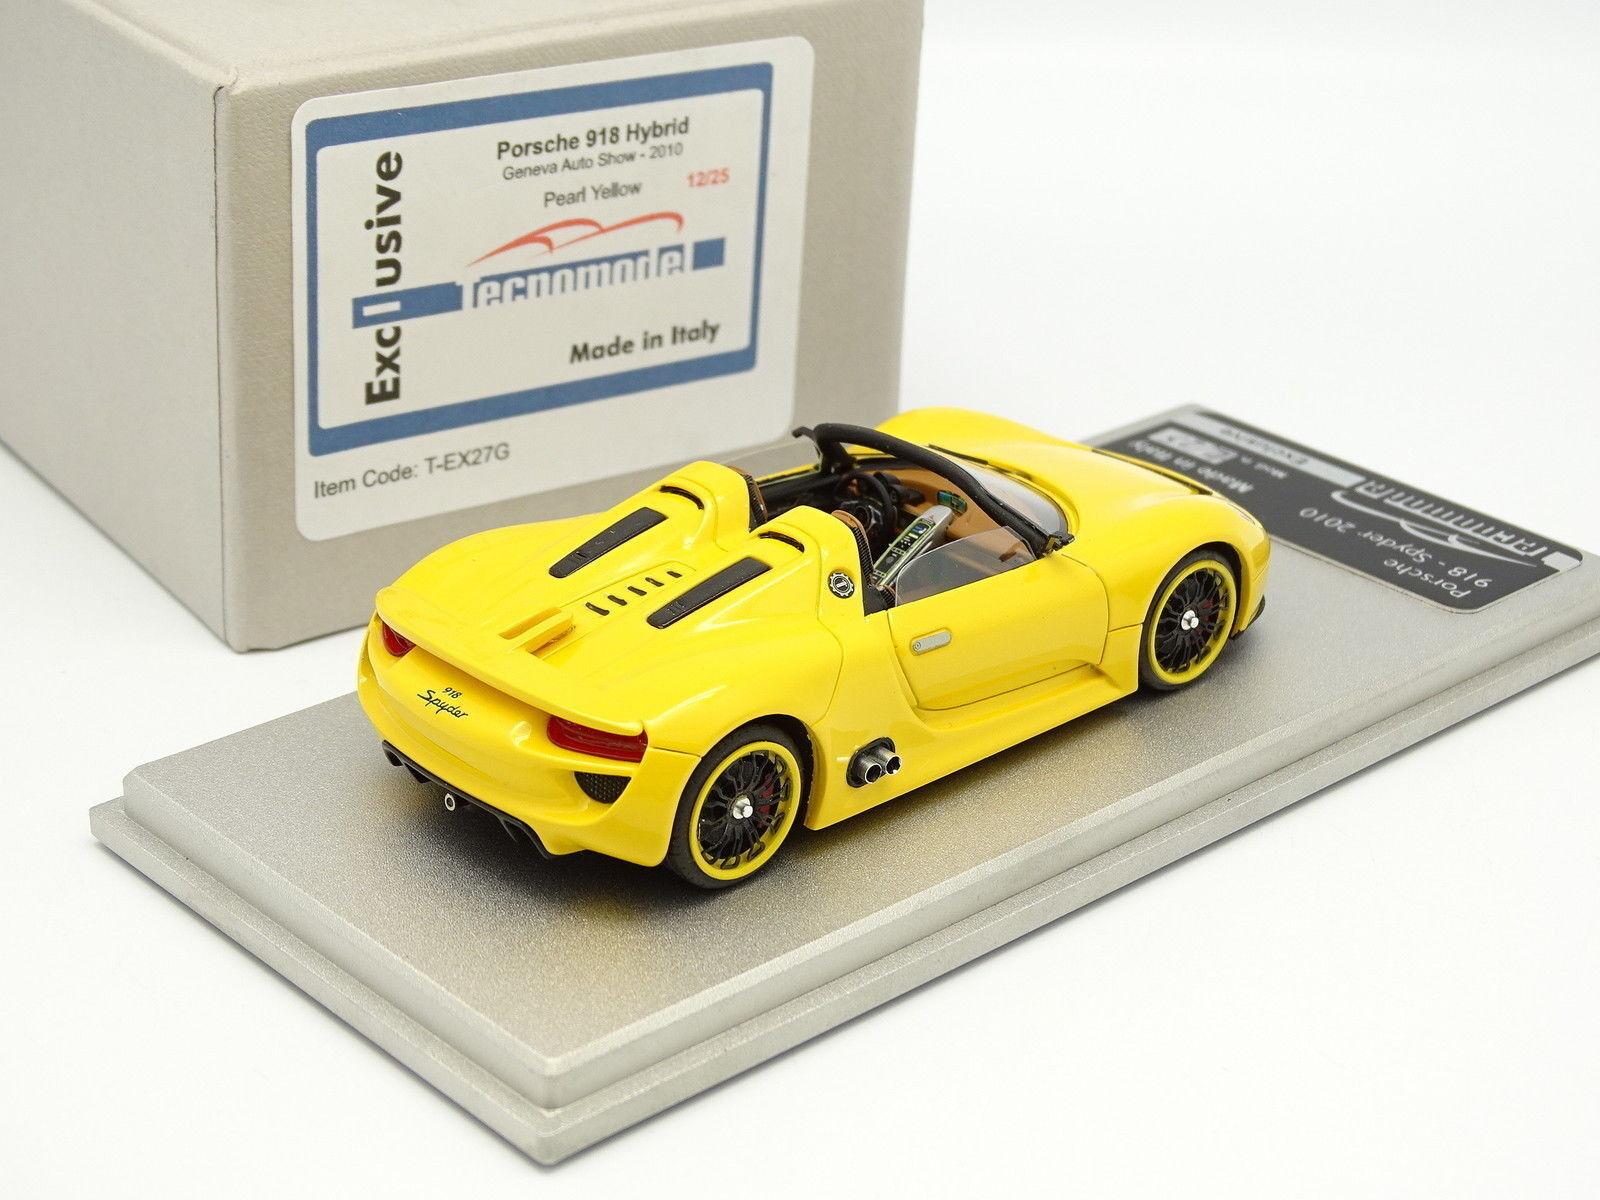 Tecnomodel 1 43 - - - Porsche 918 Hybrid Geneva 2010 Pearl Yellow 25 ex 7b2cff